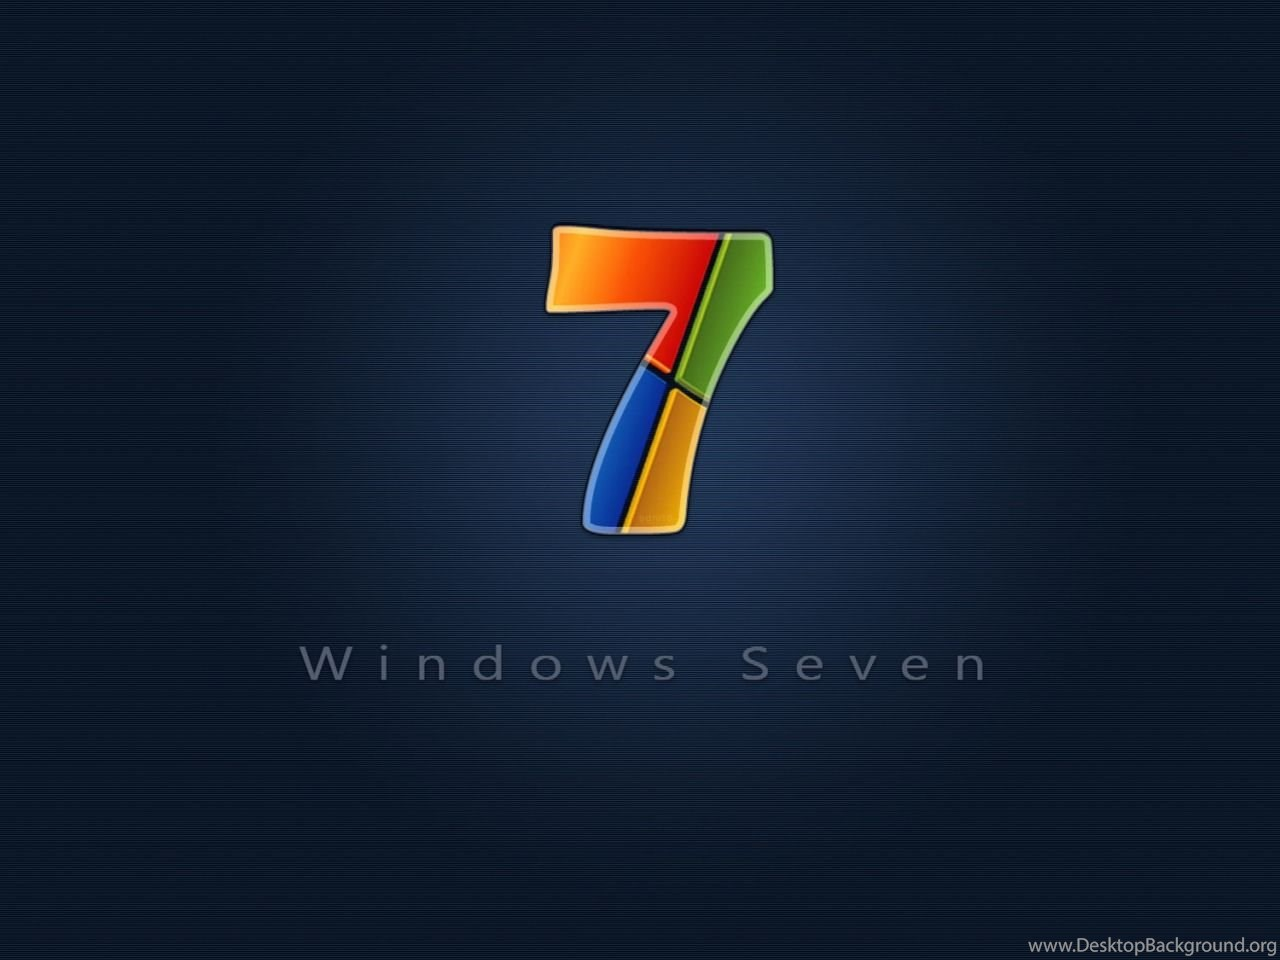 1280x1024 Windows 7 Wallpapers Hd Desktop Backgrounds 1280x1024